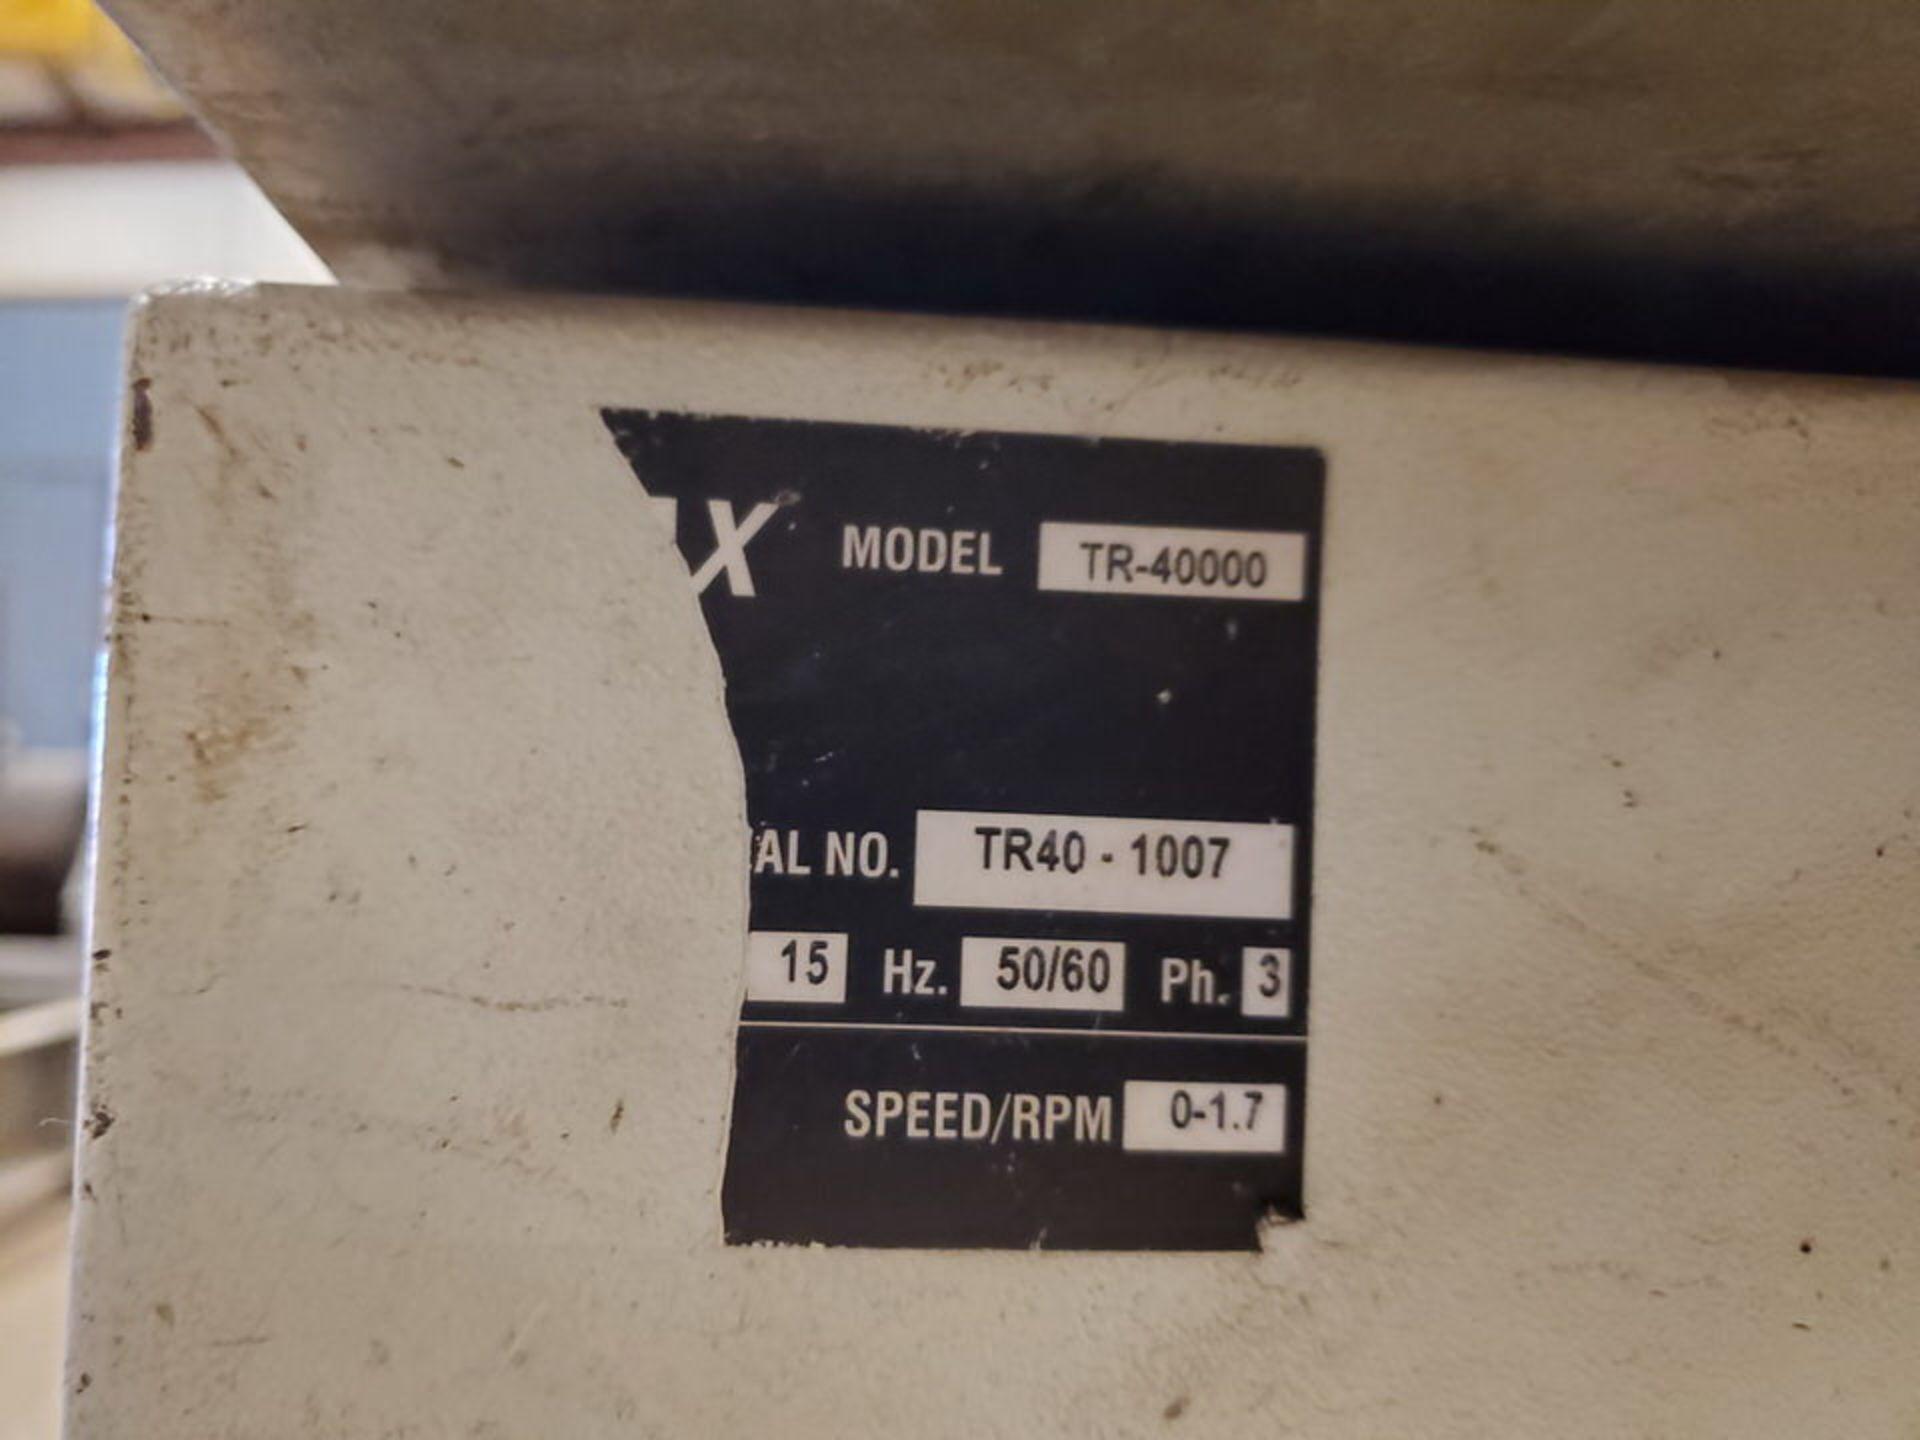 "Profax TR-40000 Turn Roll 40K Cap., 440V, 15A, 50/60HZ, 3PH, RPM: 0-1.7, 6"" Wheel Dia - Image 7 of 8"